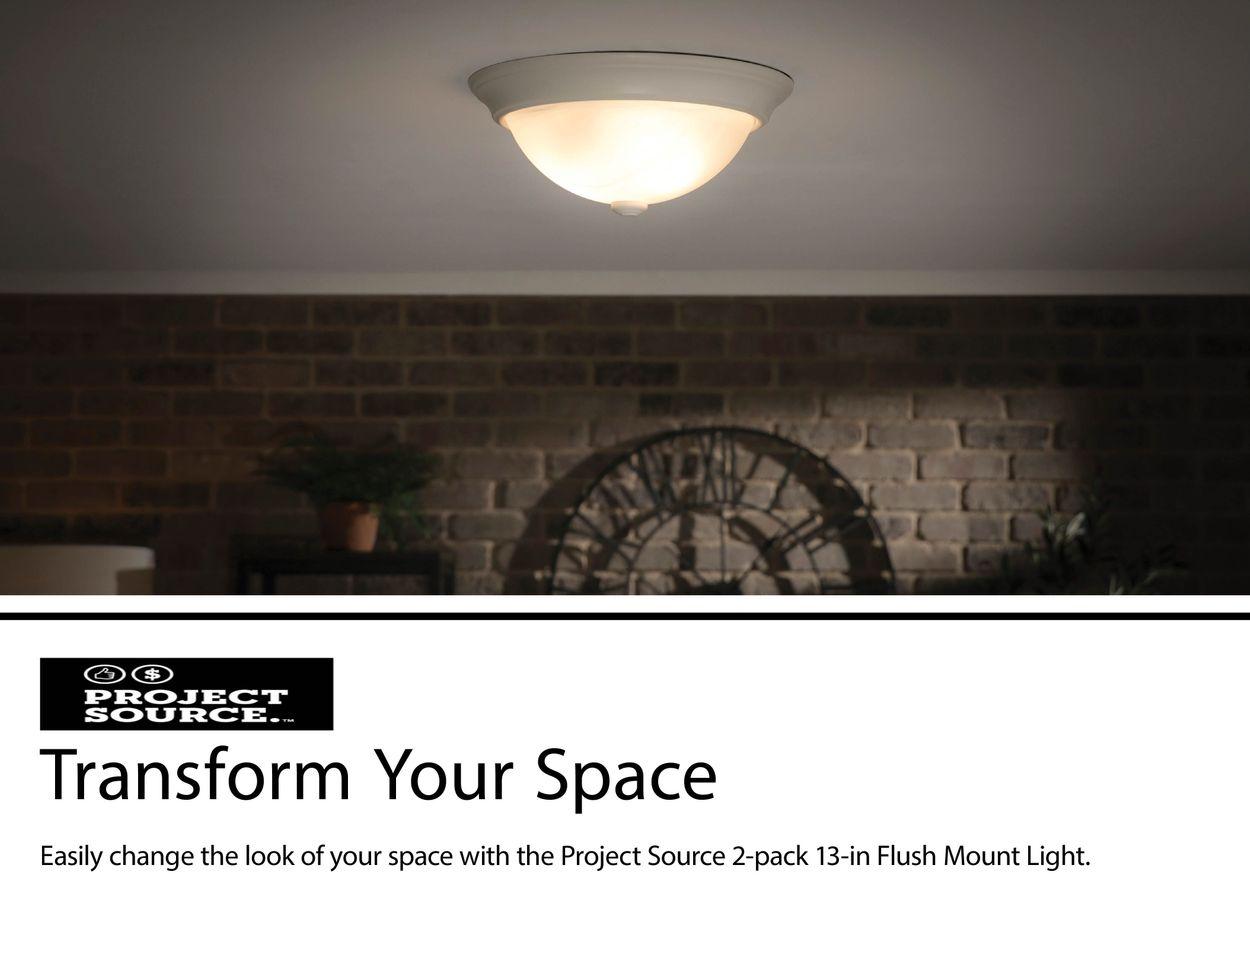 Light Fixture Tester On Wiring Light Bulb Fixture As Well 1000 Images